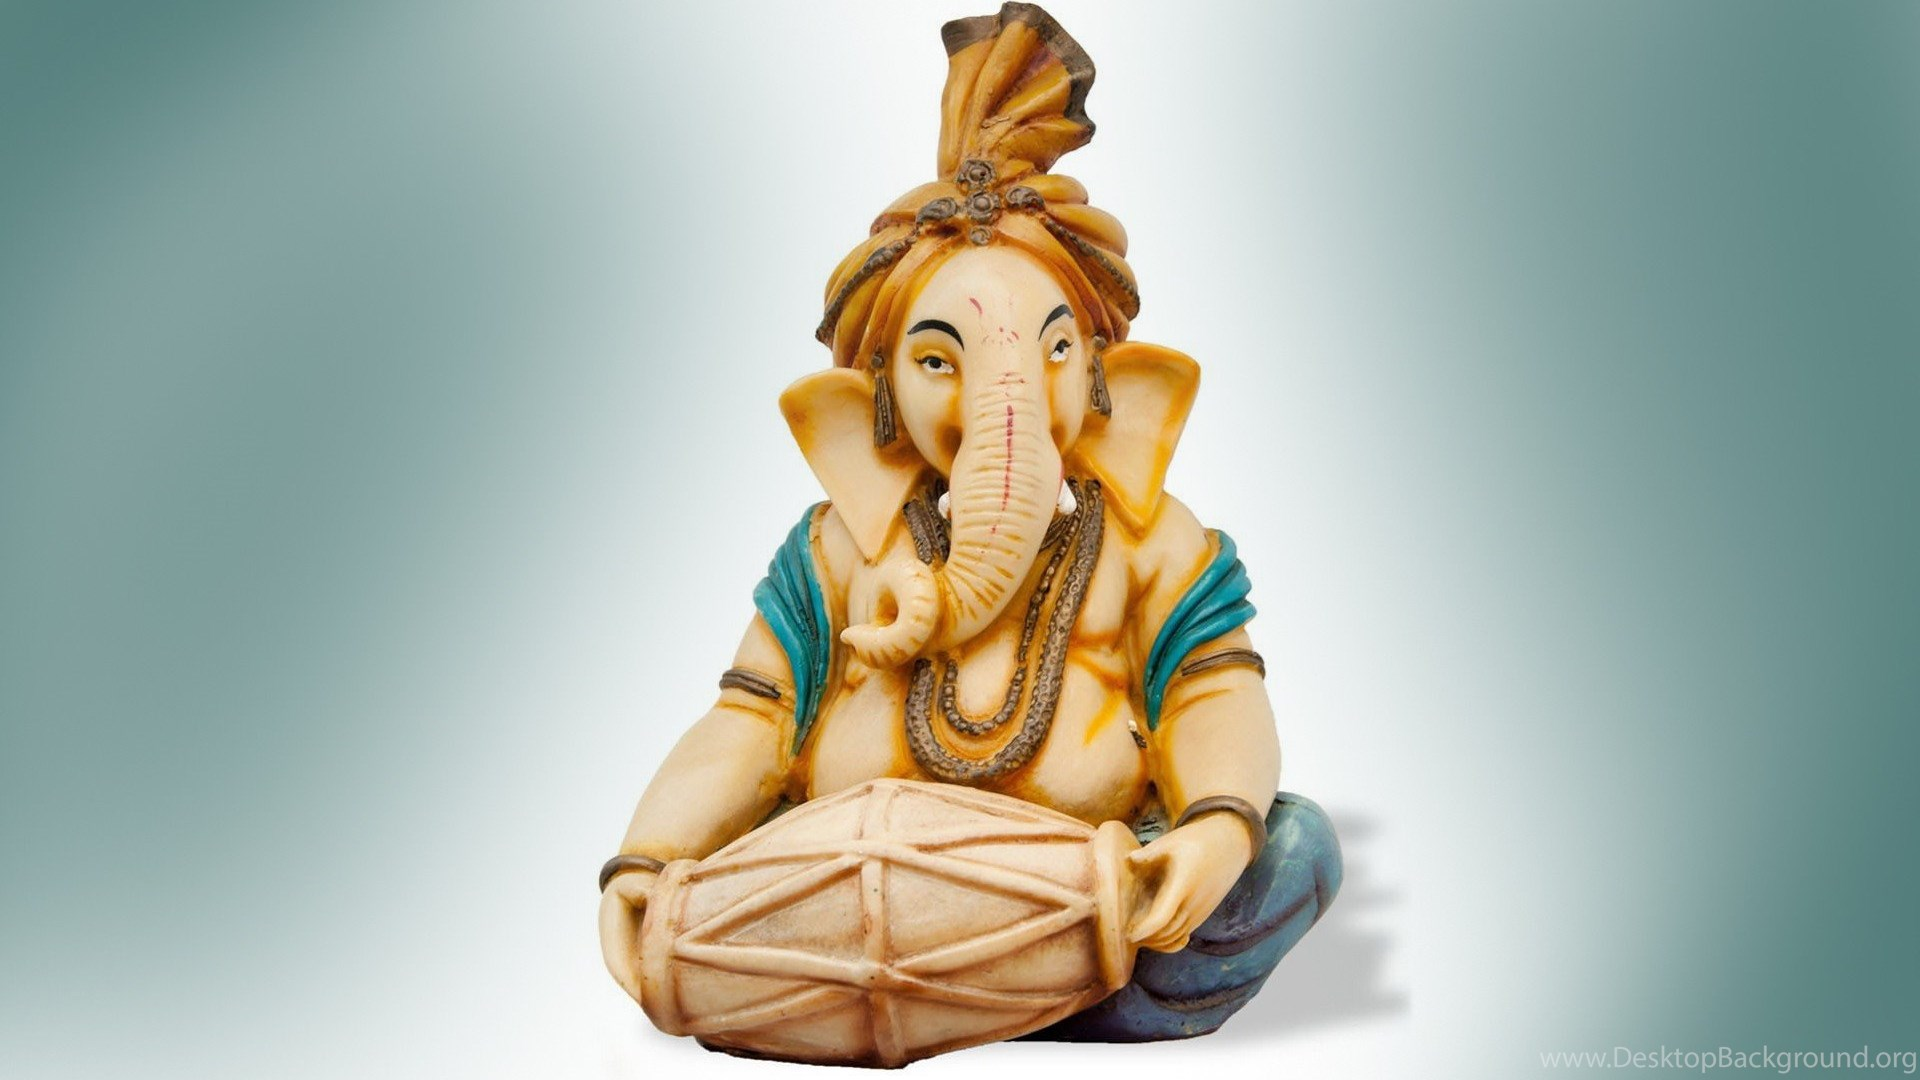 God Ganesh Music Hd Wallpapers Desktop Background